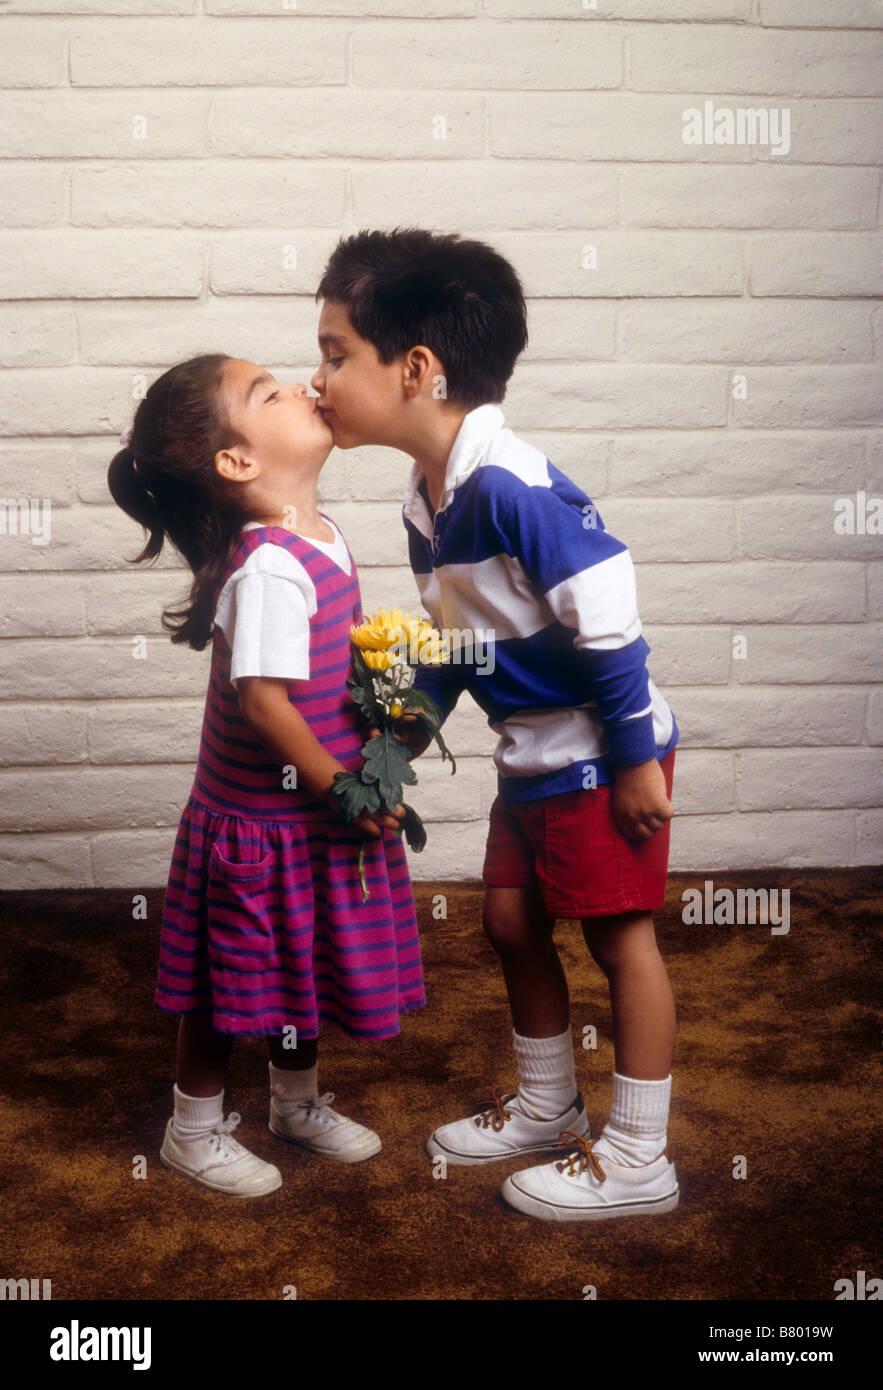 Hispanic Brother And Sister Kiss Love Sibling Stock Photo 22128677